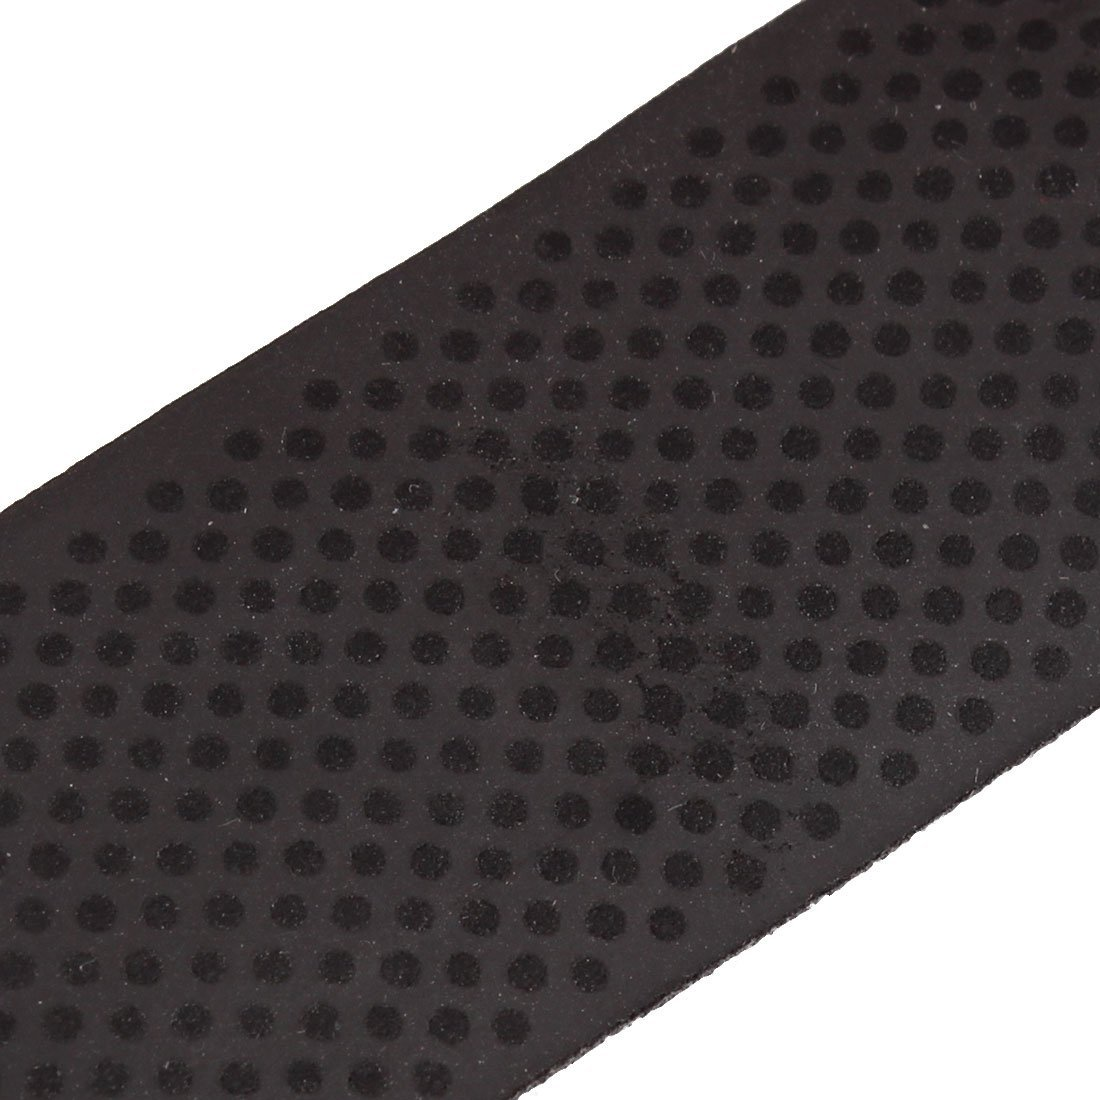 Amazon.com : eDealMax espuma mancuernas caña de pescar antideslizante raqueta de absorción del sudor Cinta de agarre 2 piezas Negro : Sports & Outdoors